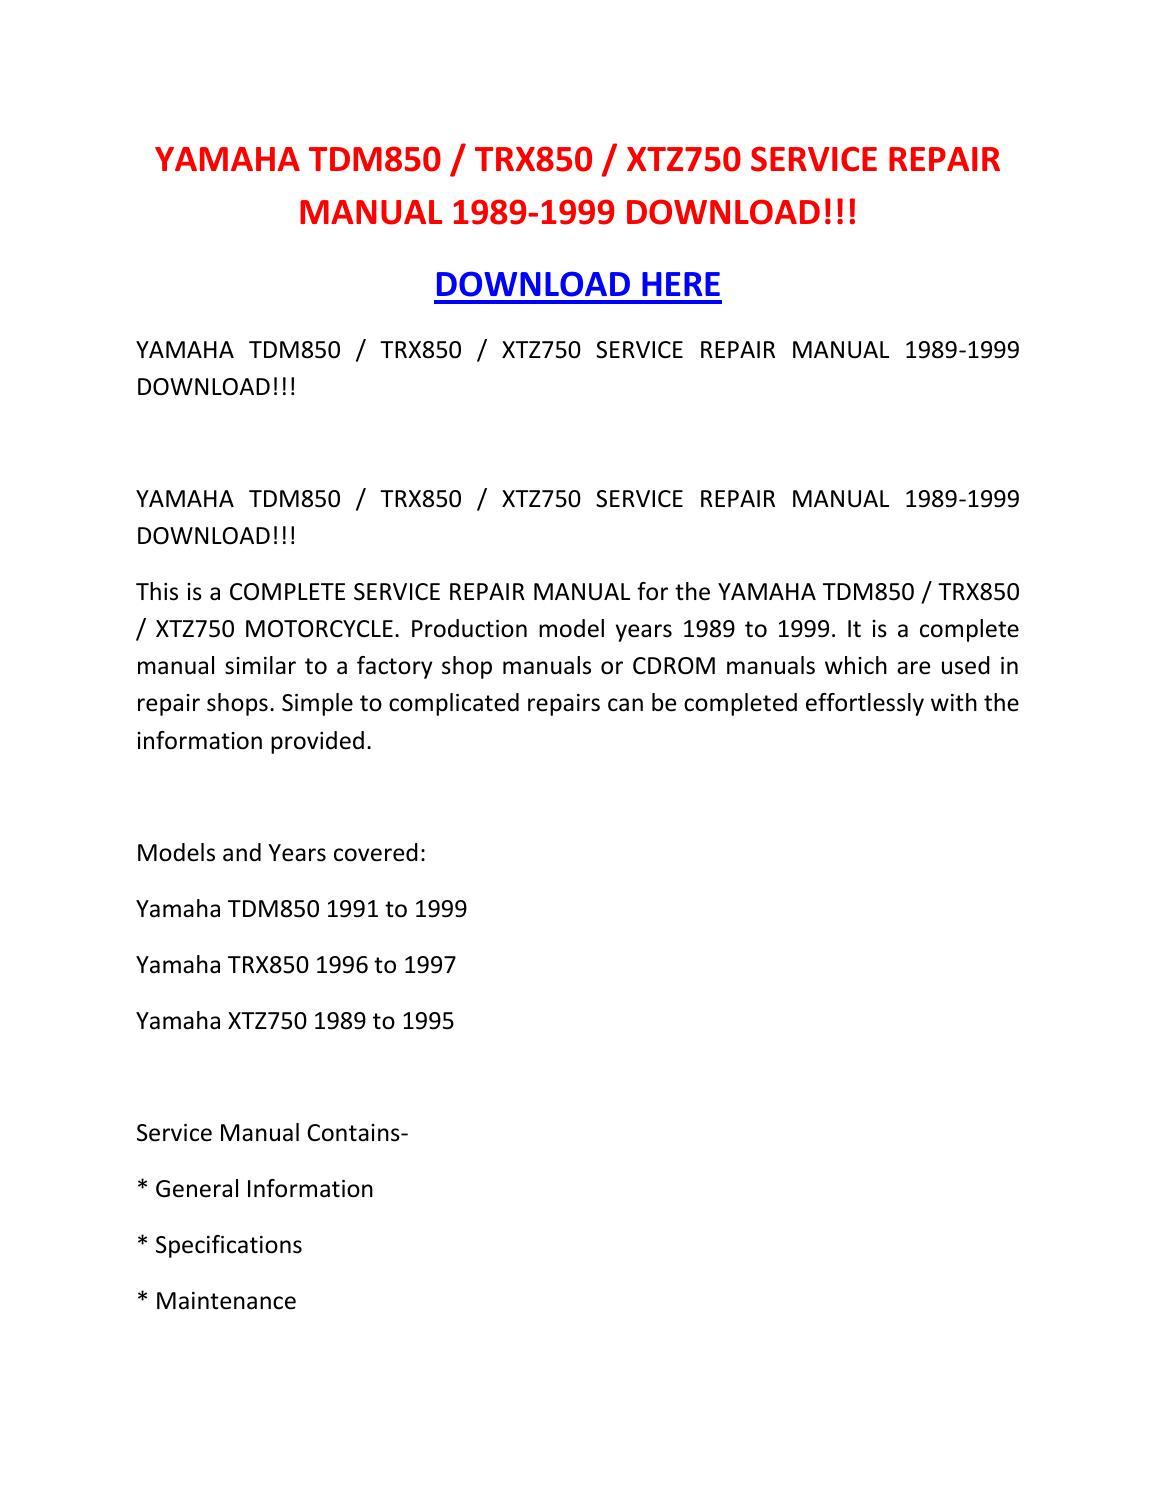 Yamaha tdm850 trx850 xtz750 service repair manual 1989 1999 download!!! by  suzettespoonerowqbdt - issuu